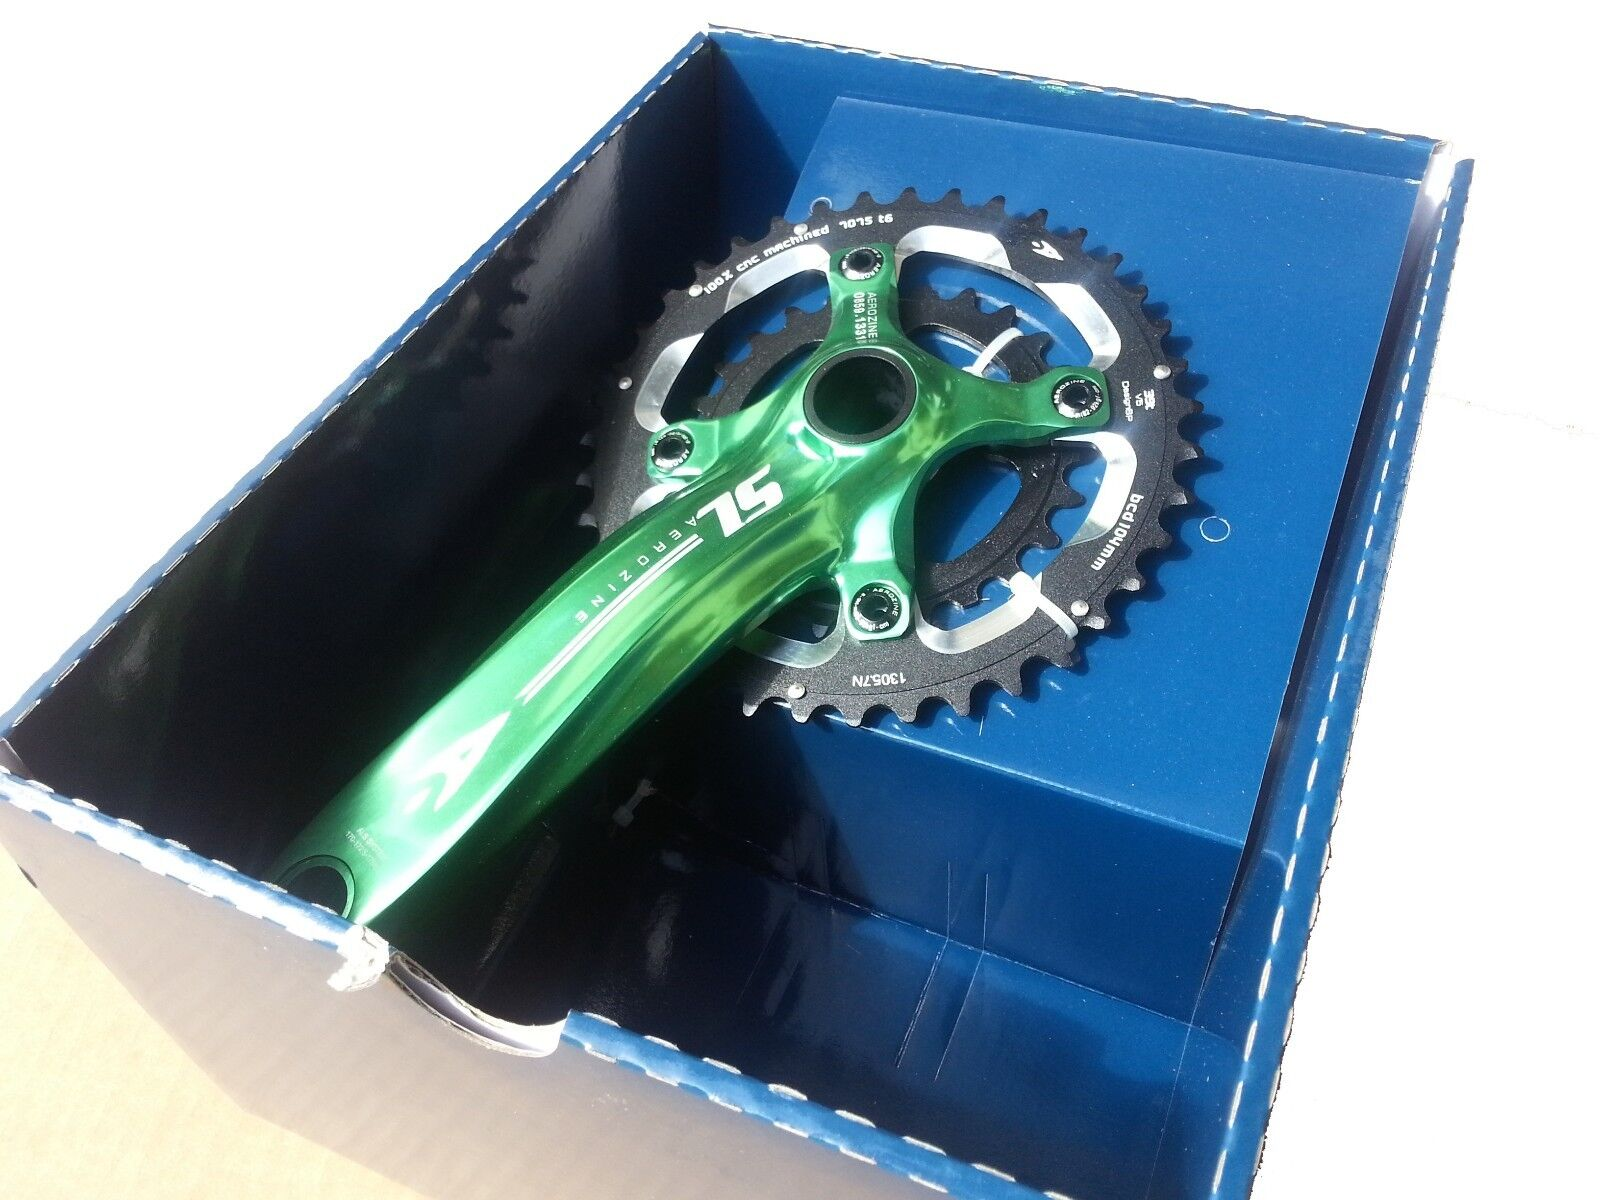 Aerozine Mountain Bike Crankset Double 39 26 170mm 175mm X12SL A2D 2x10 GREEN